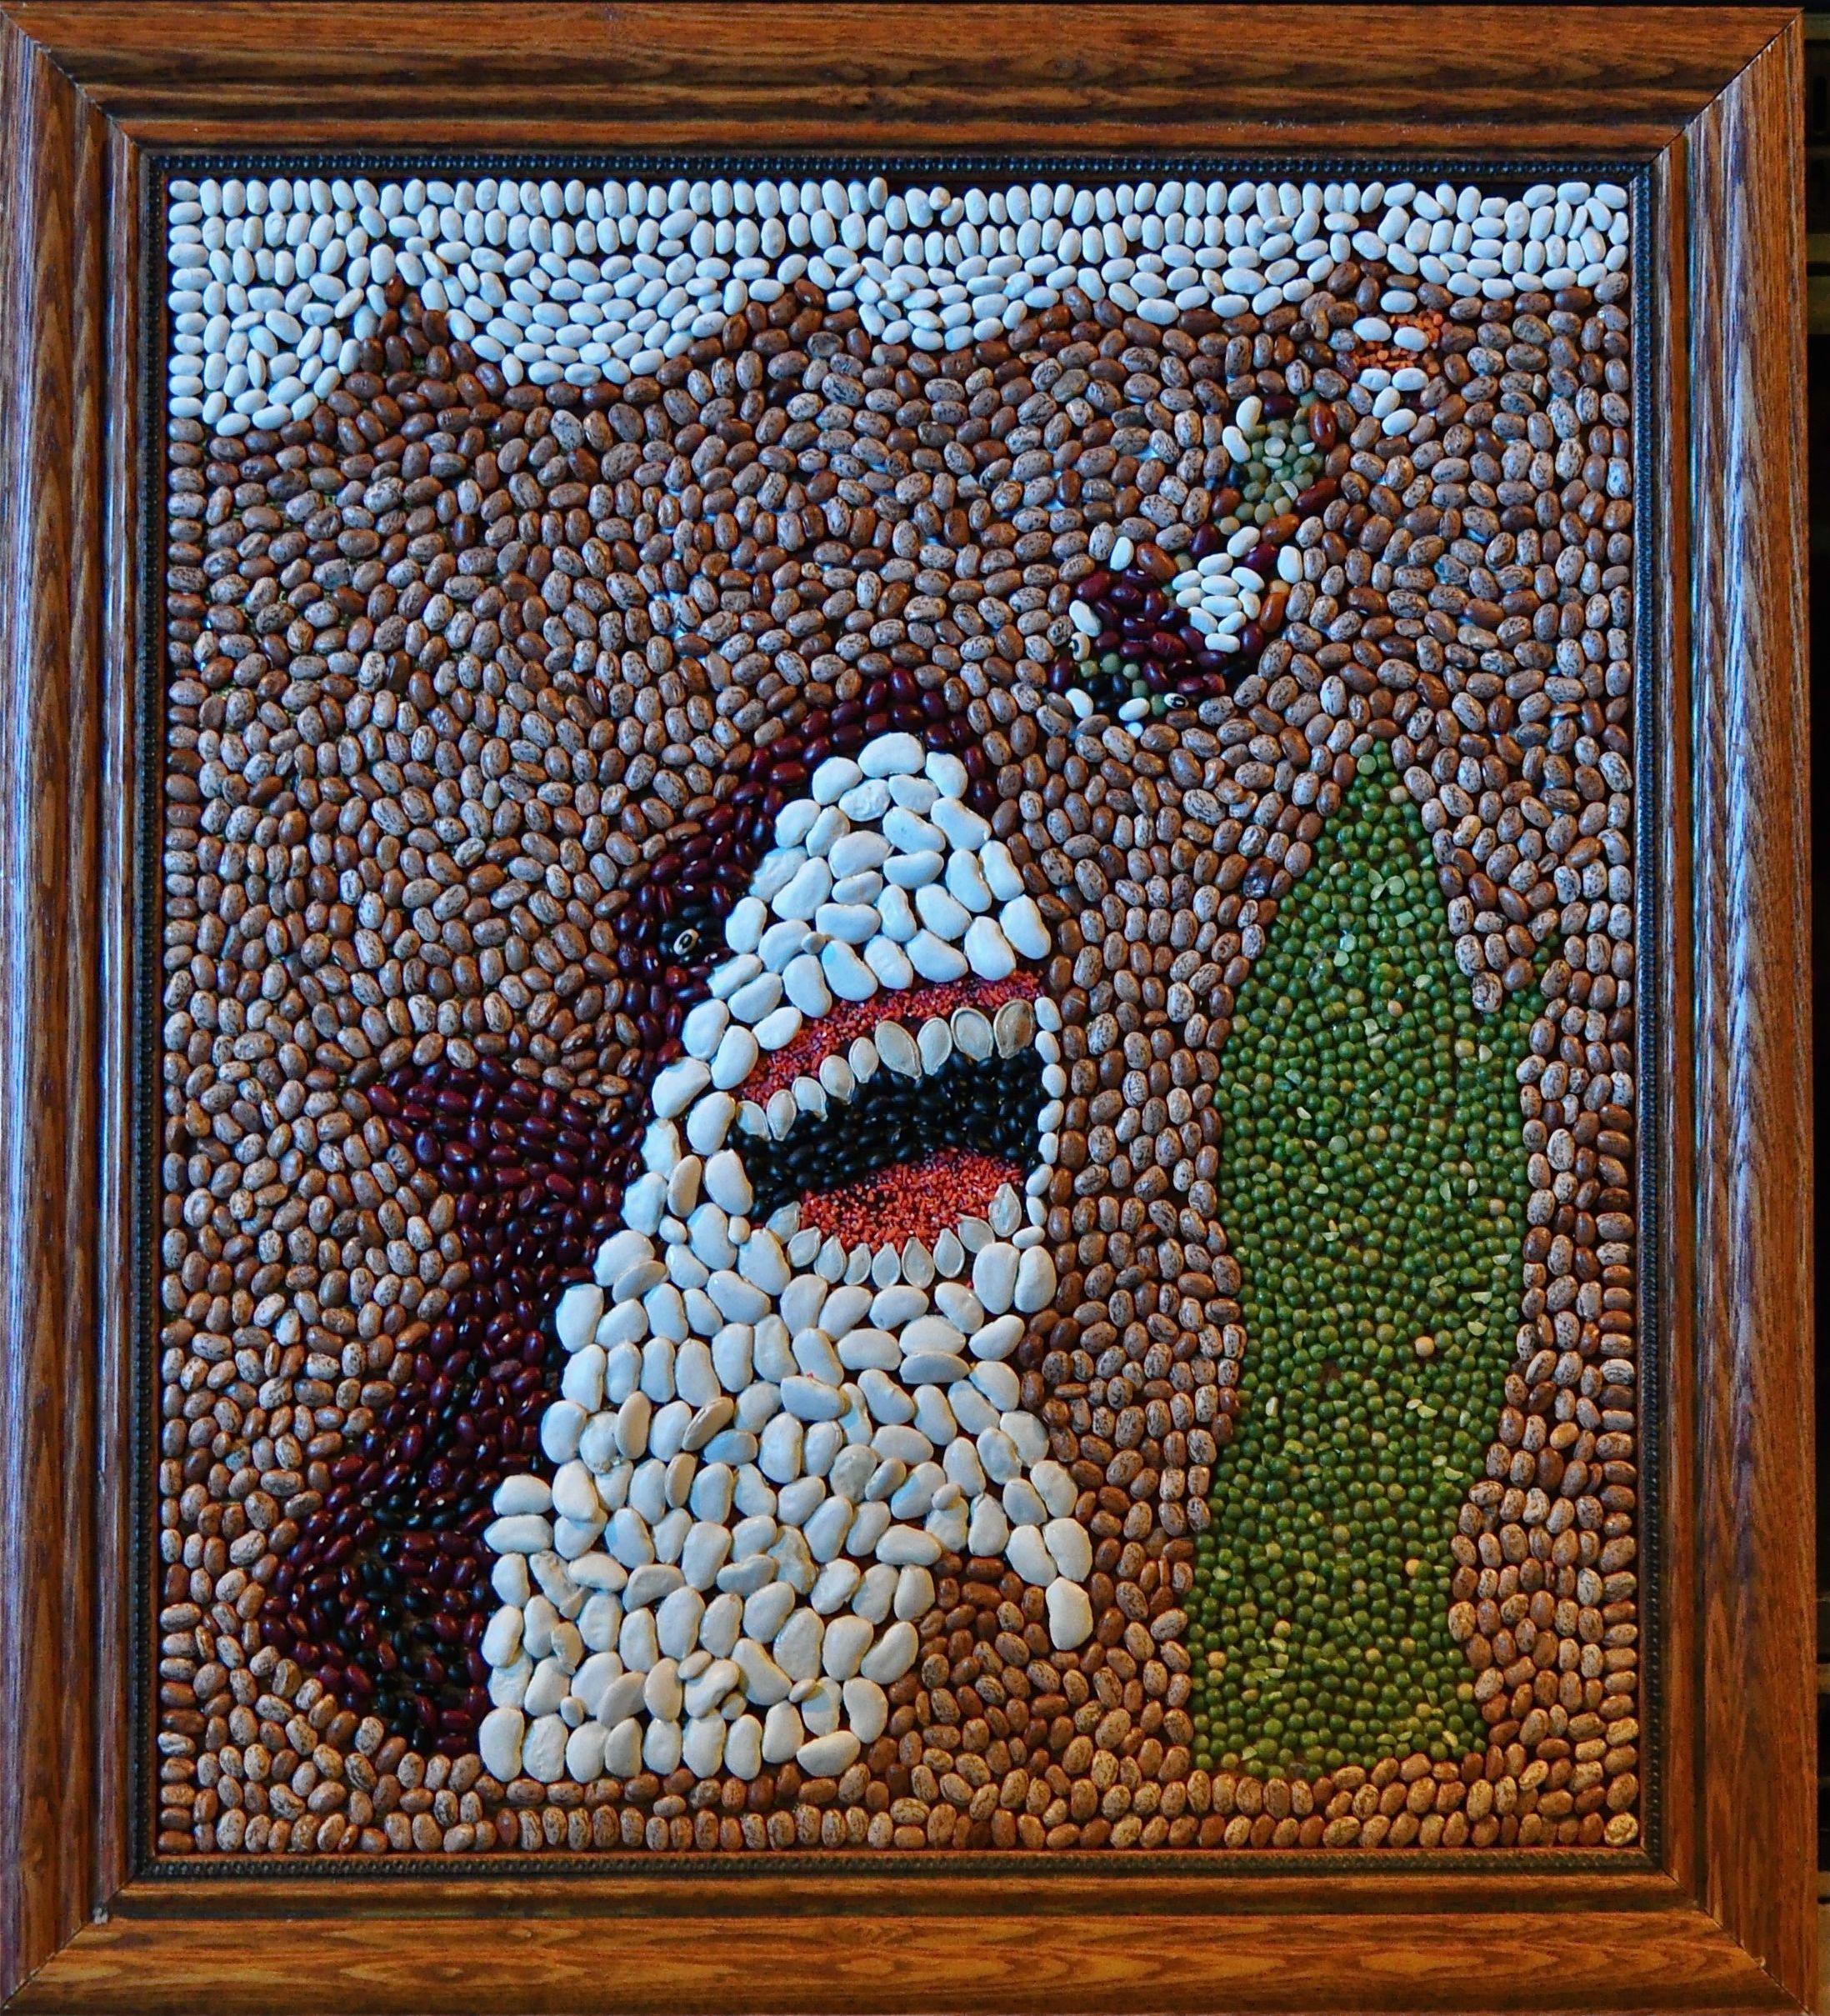 Bean and seed mosaic